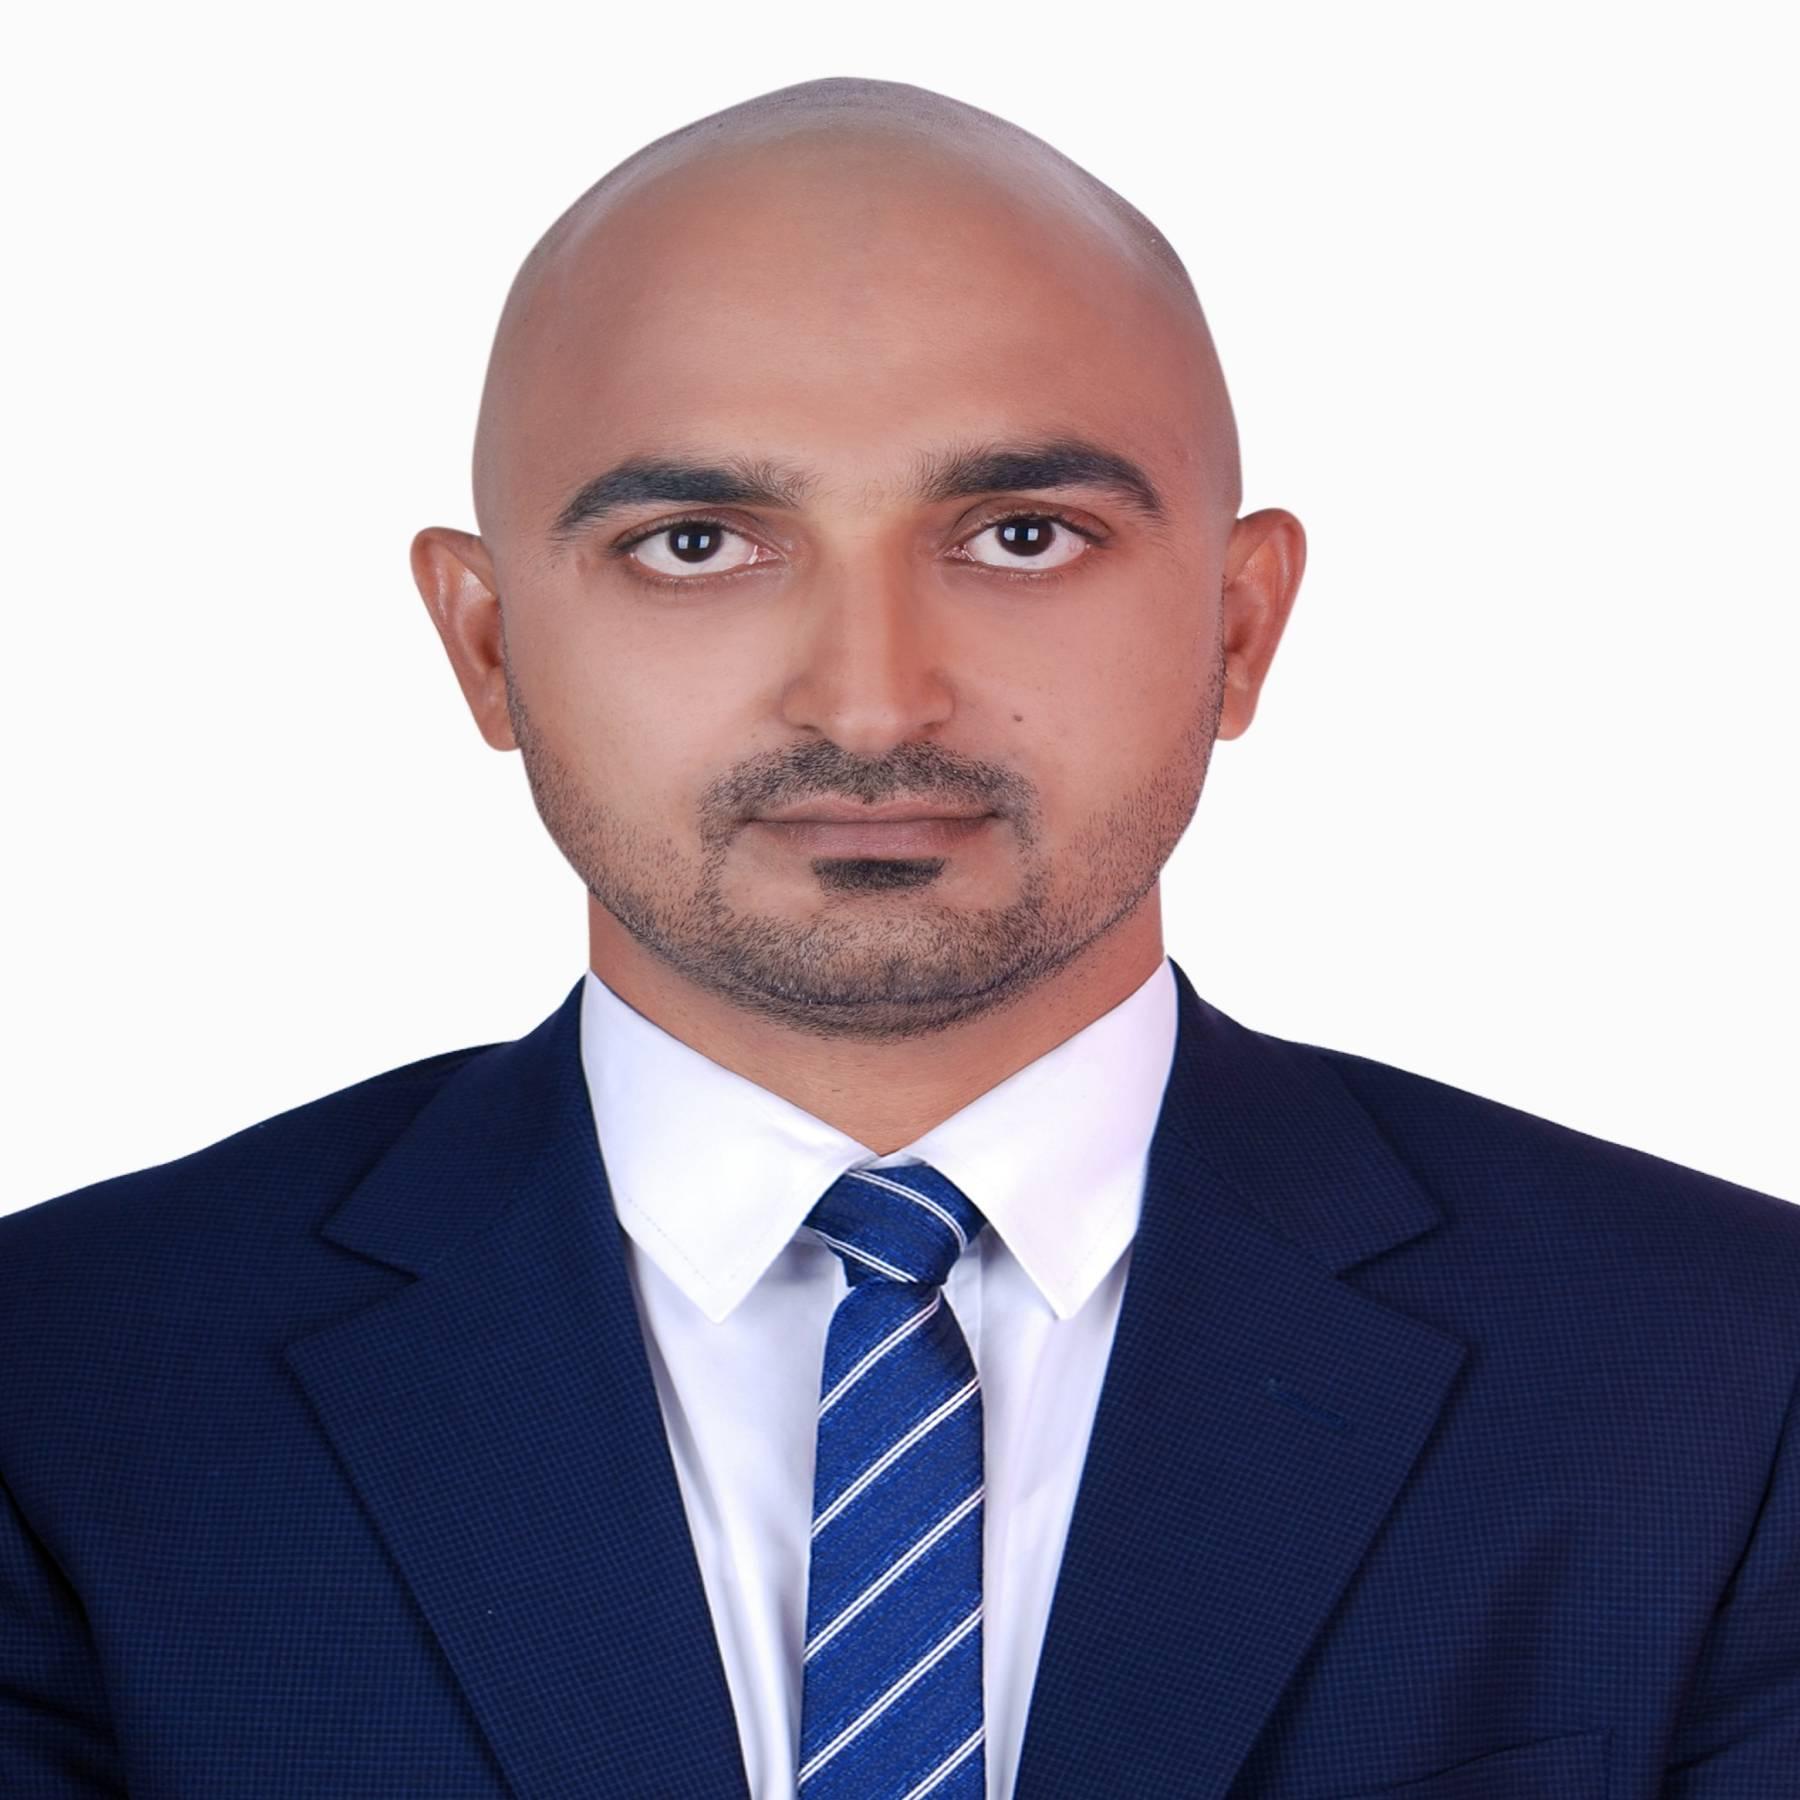 Muhammad Zaman